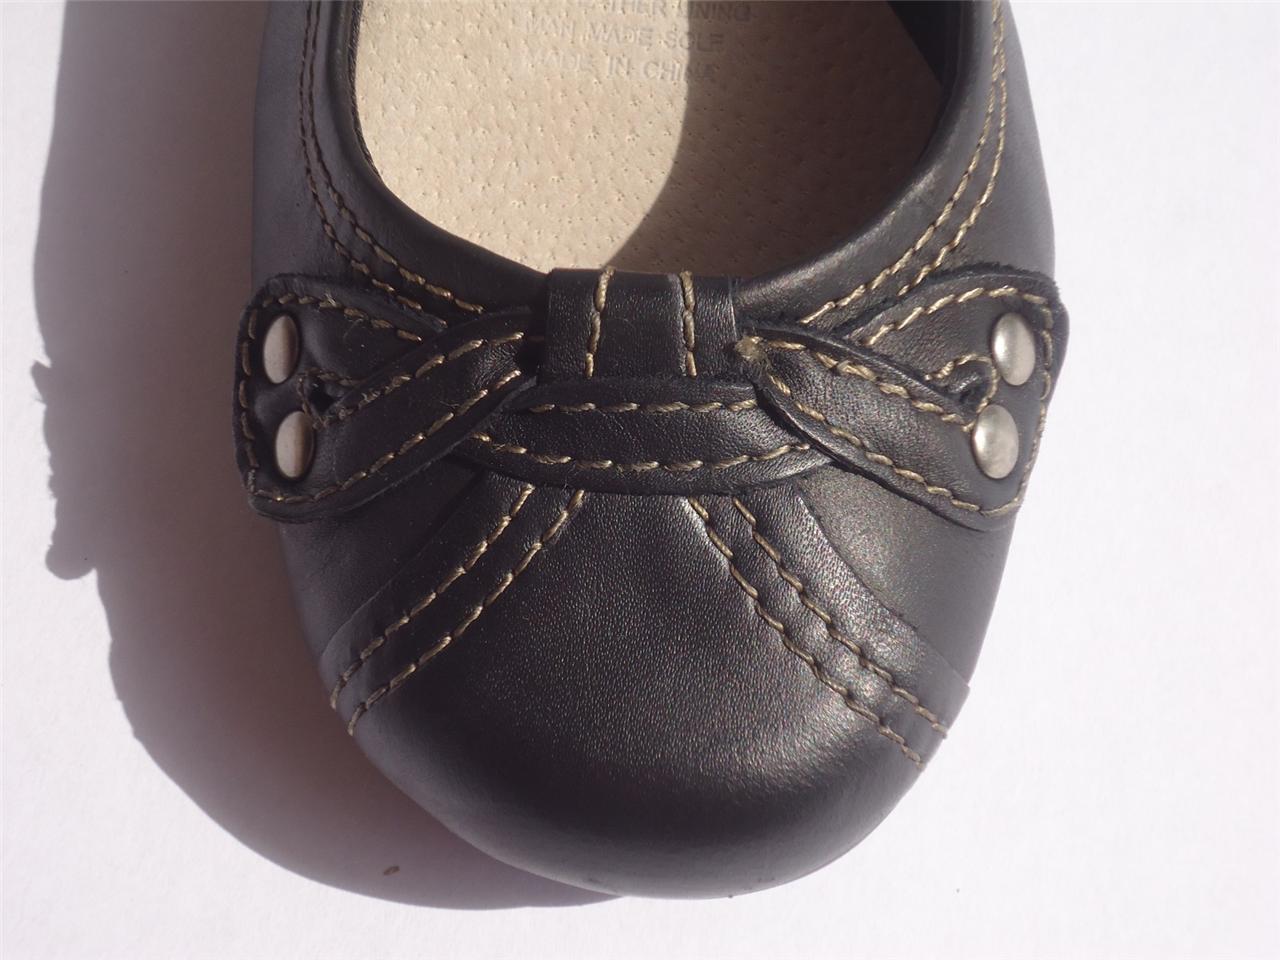 New-Womens-Supersoft-Diana-Ferrari-Leather-Shoe-Work-Black-Sz-6-7-8-9-10-11-12